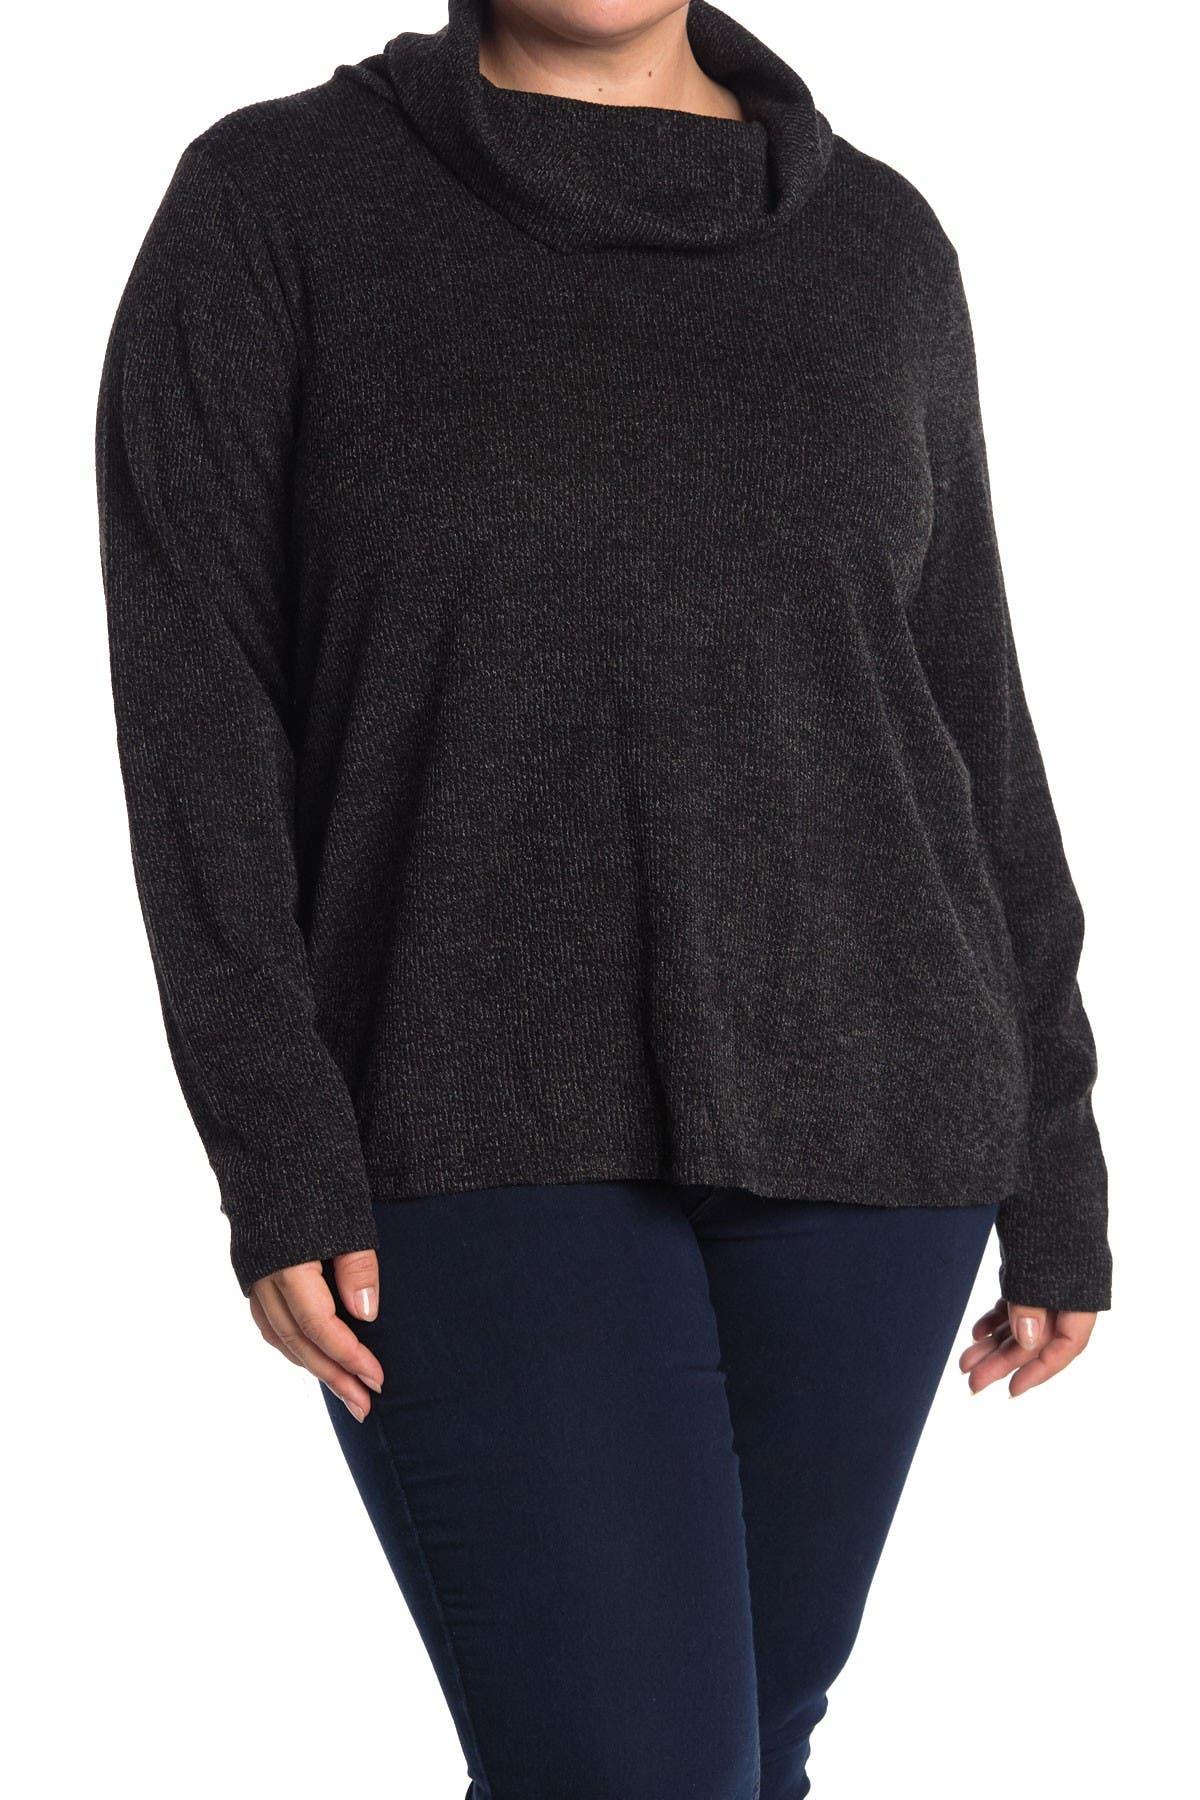 Image of Bobeau Anvers Chunky Turtleneck Sweater